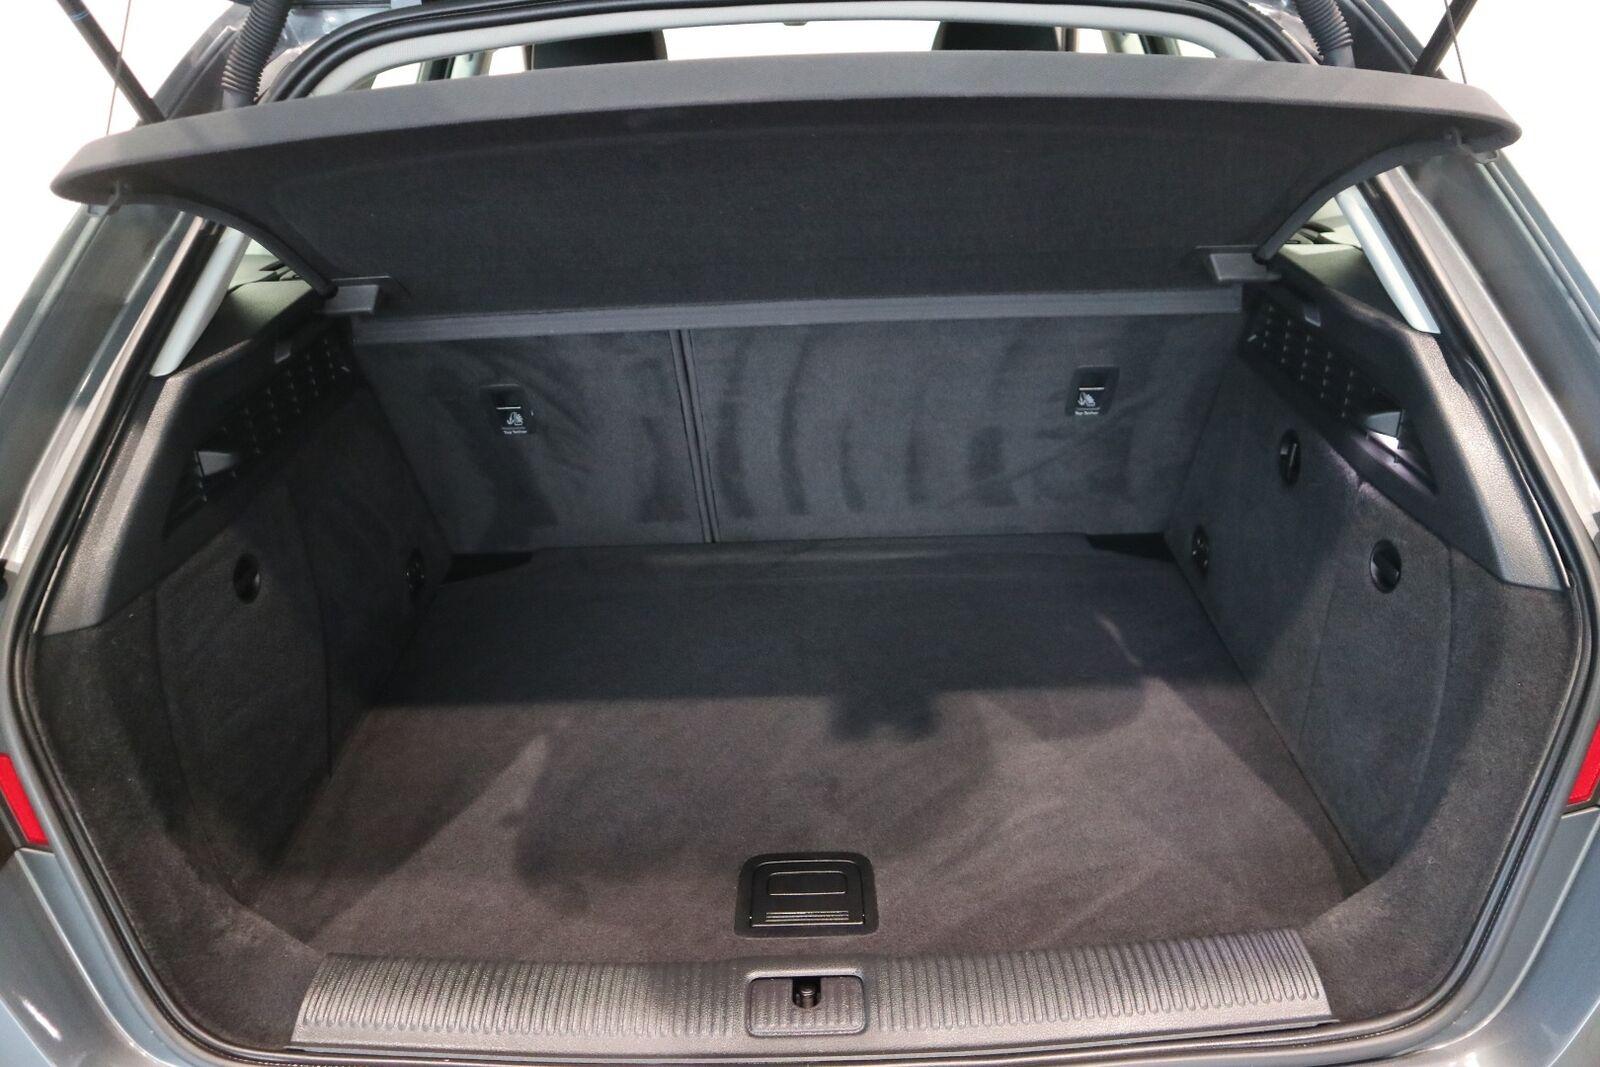 Audi A3 1,4 TFSi 122 Ambition Sportback  S-tr. - billede 15